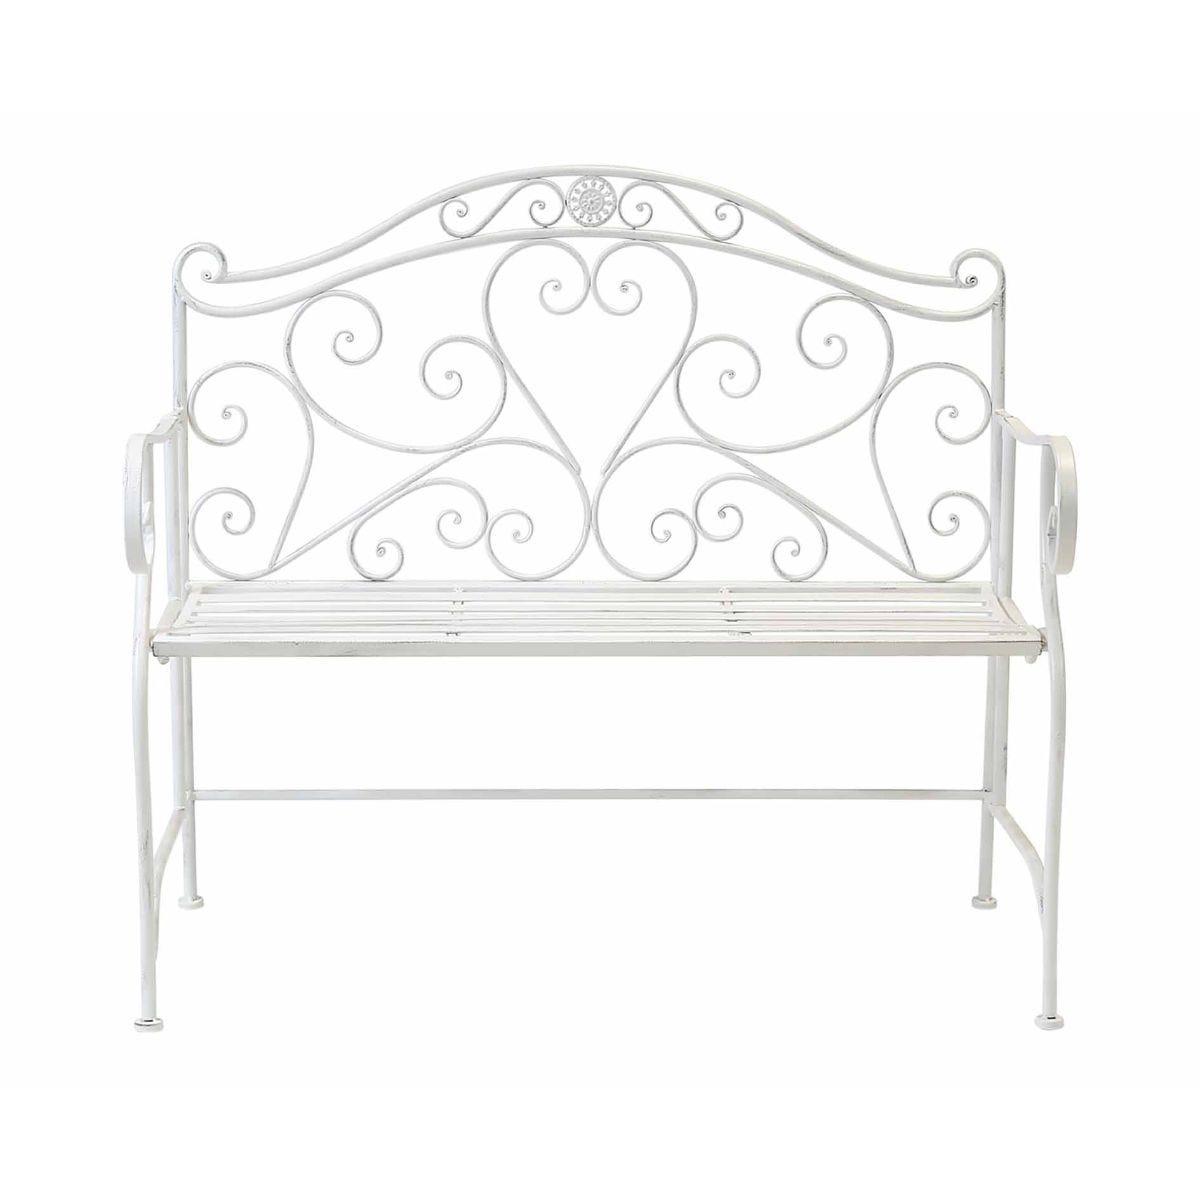 Charles Bentley Wrought Iron Garden Bench, White